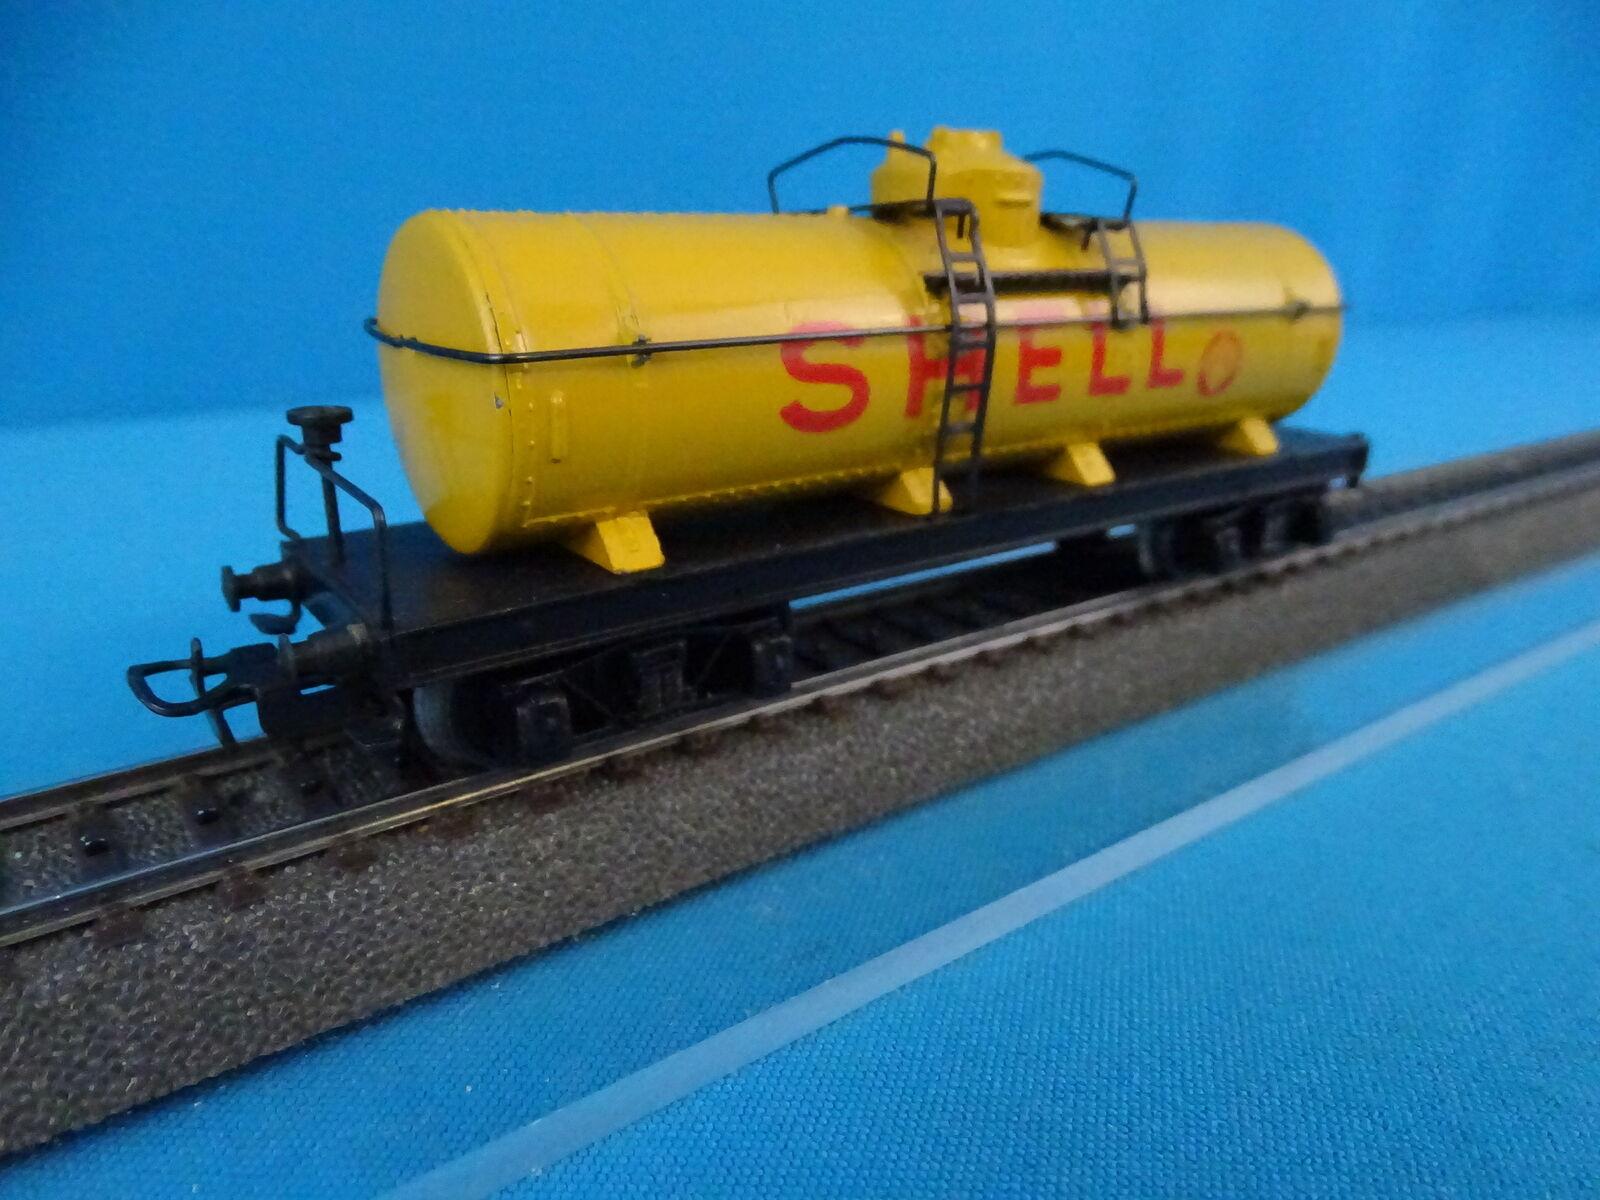 Marklin 334 S Shell Four Axled Tanker Car Vers. 2 OVP MINT